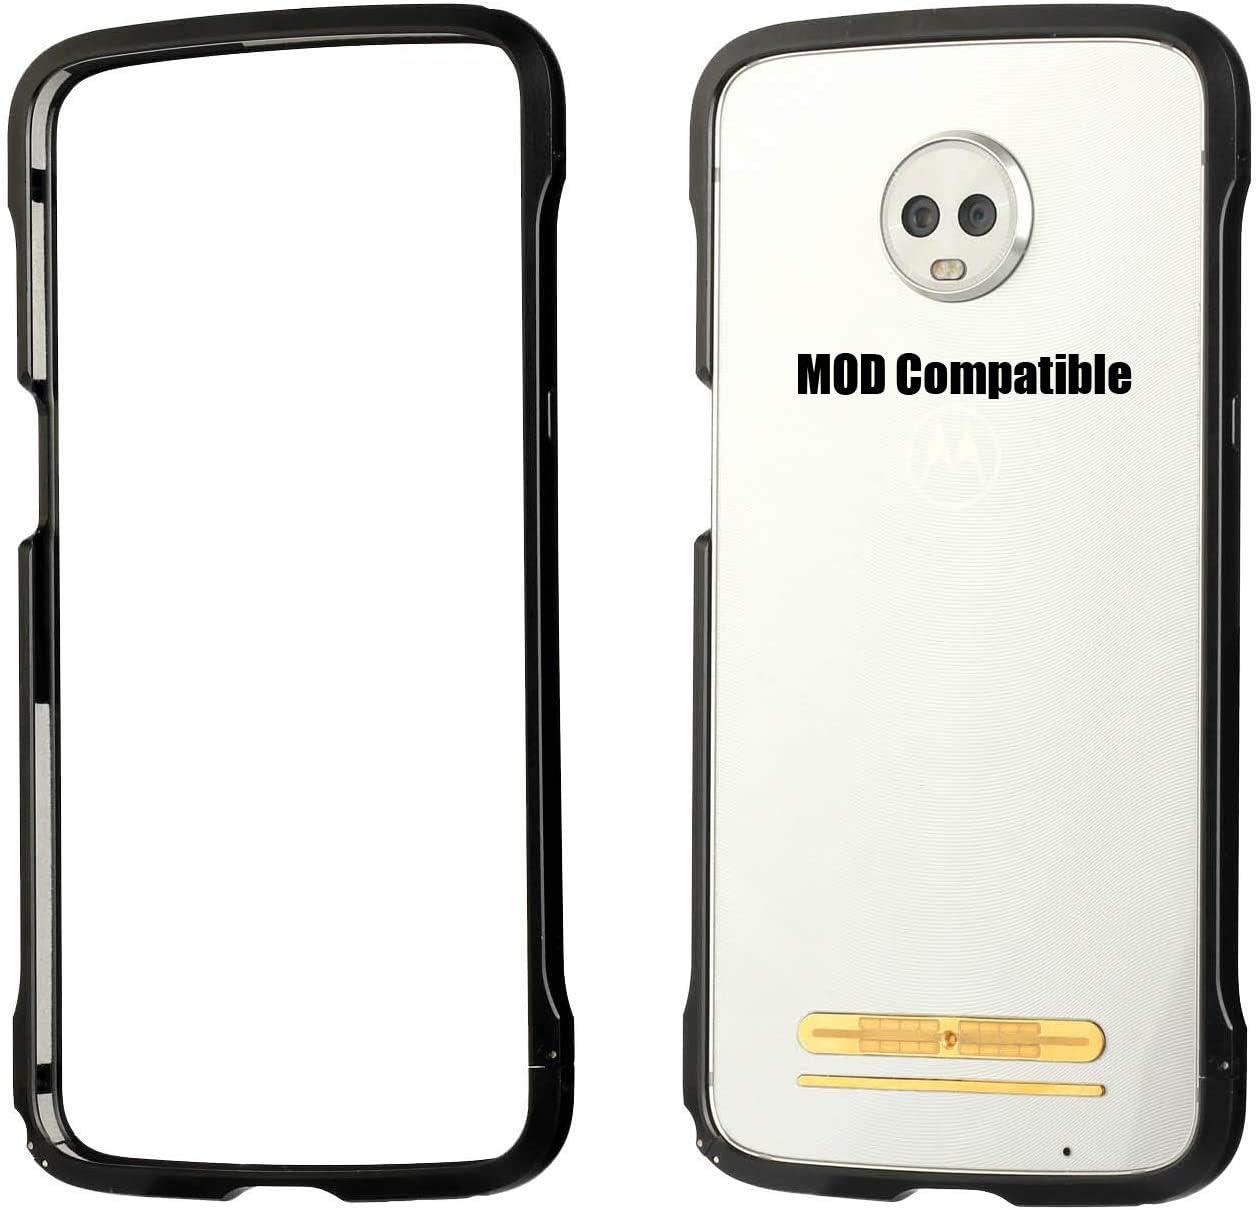 Moto Z3 Case, Moto Z3 Play Metal Bumper Case Compatible Moto Mod Luxury Aluminum Alloy Frame Buckle Locking Protective Case for Motorola Moto Z3 / Z3 Play (Black)